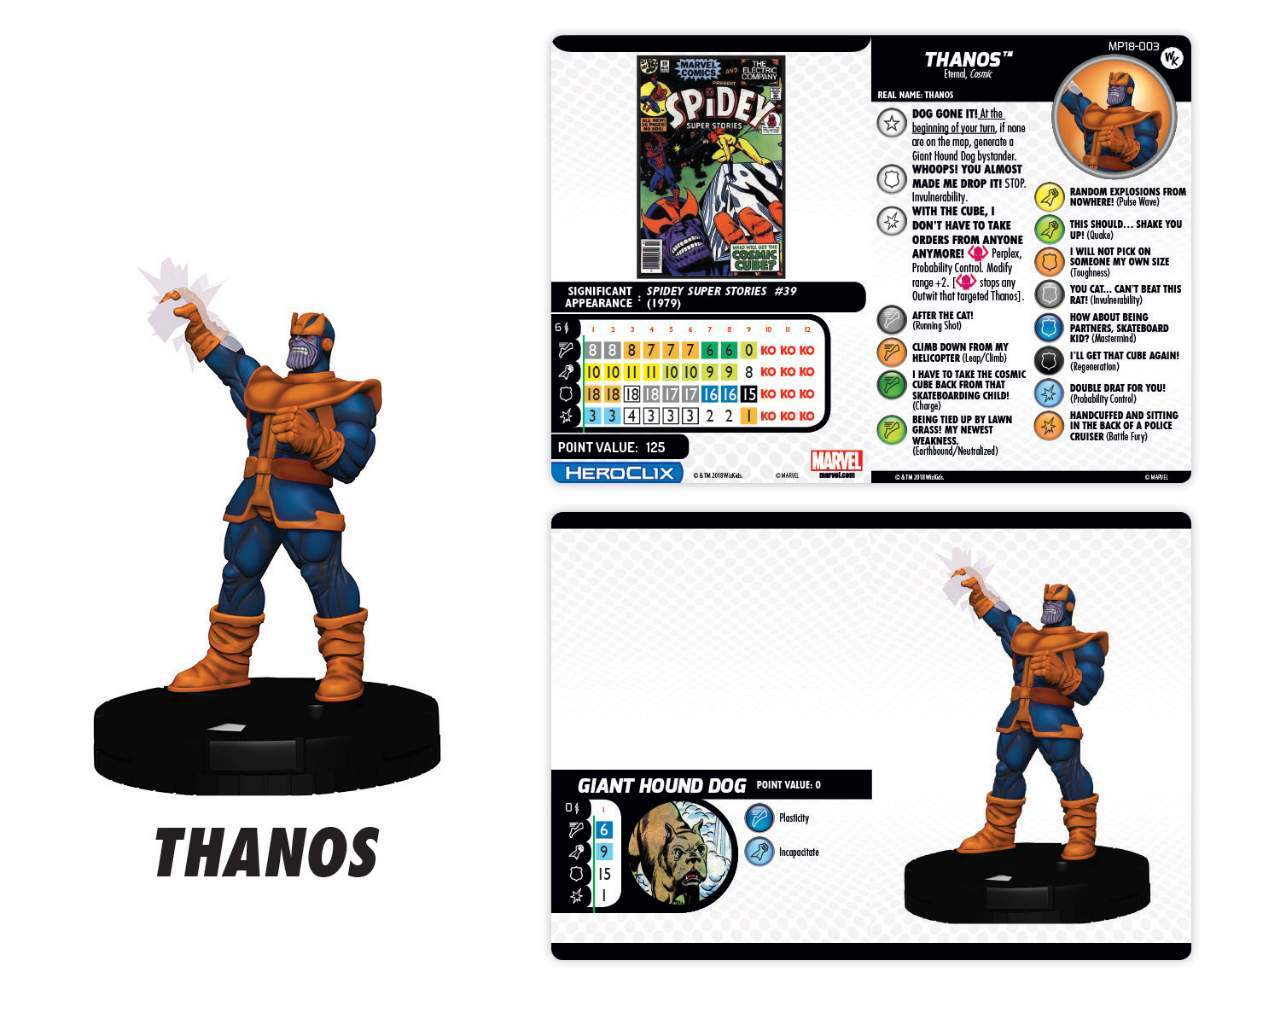 Cool Thanoscopter Infinity War Wallpaper - thanos-1097203  Collection_98528 .jpeg